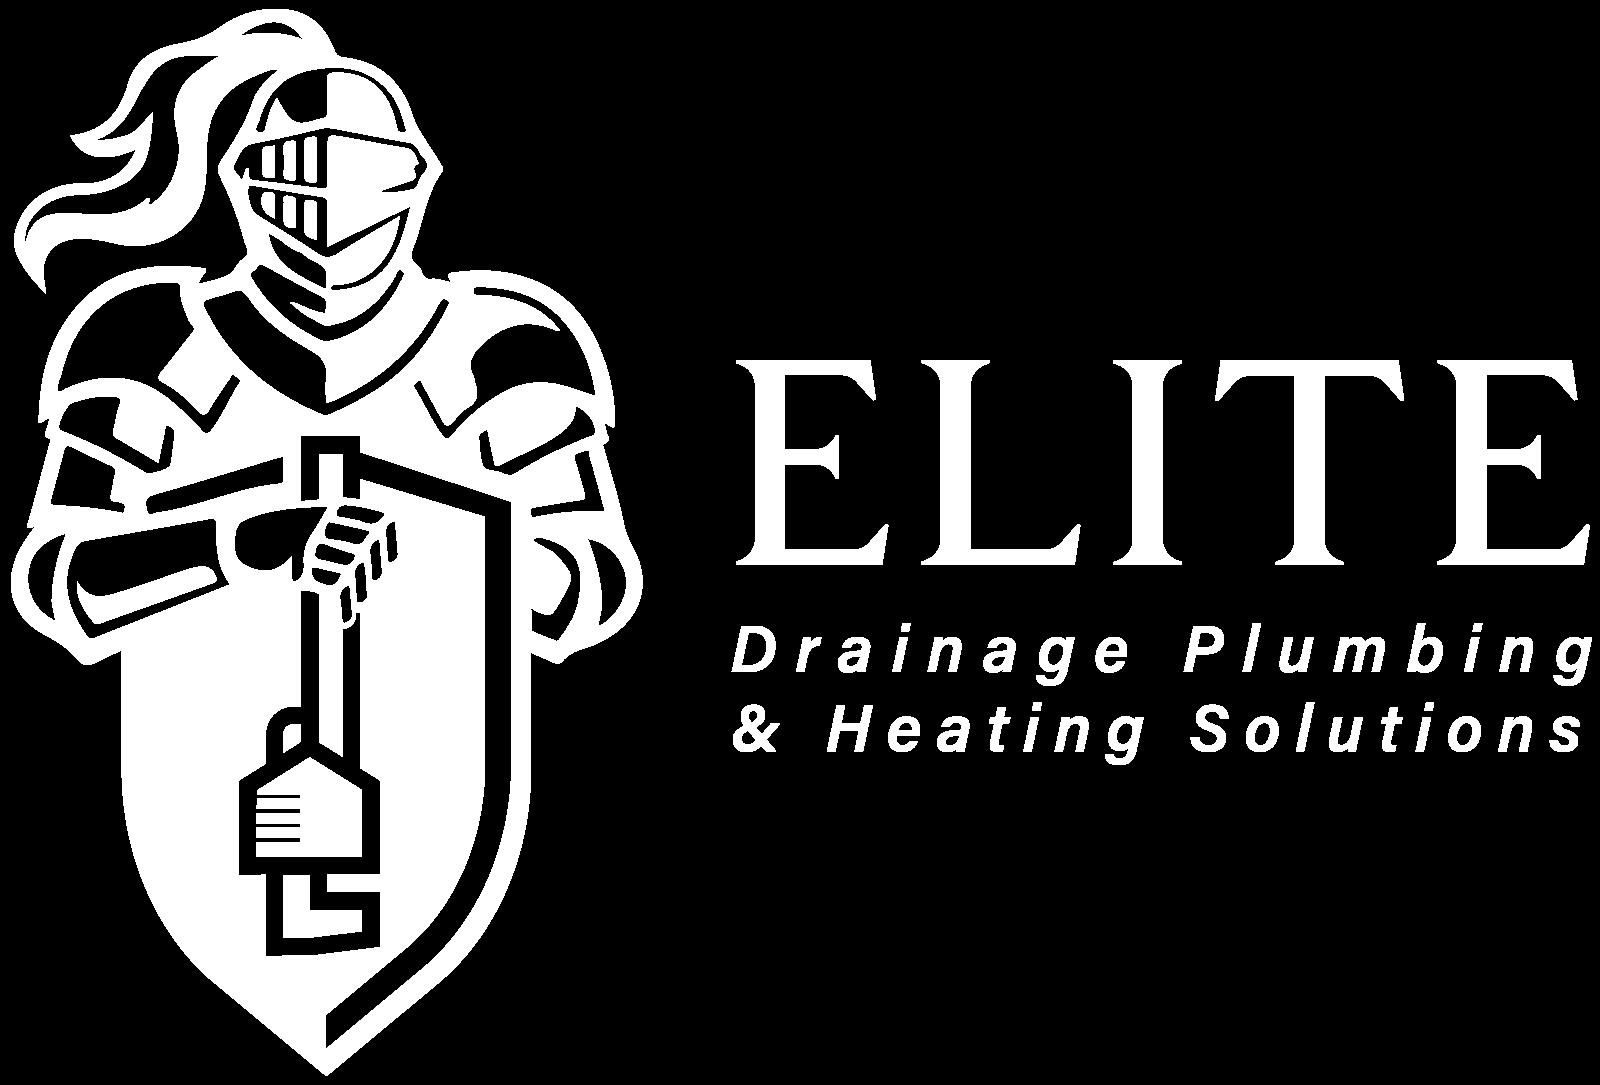 Elite Drainage Plumbing & Heating Solutions